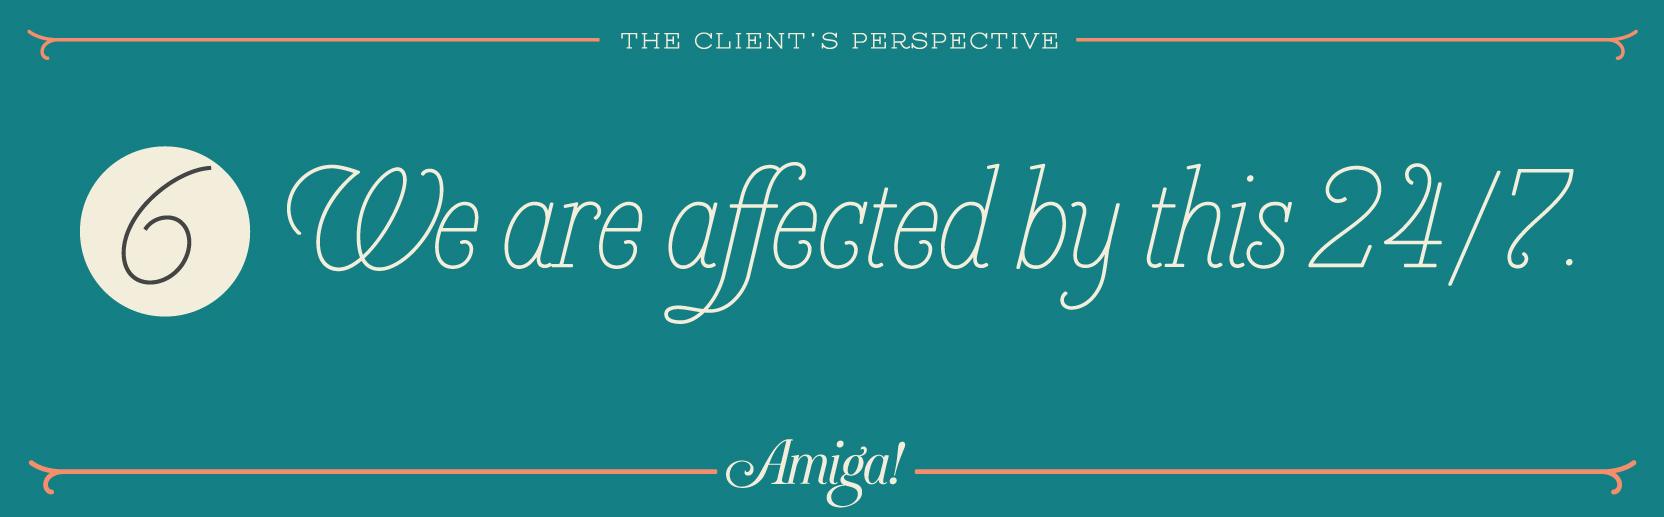 Amiga_clientPerspective_working6.jpg